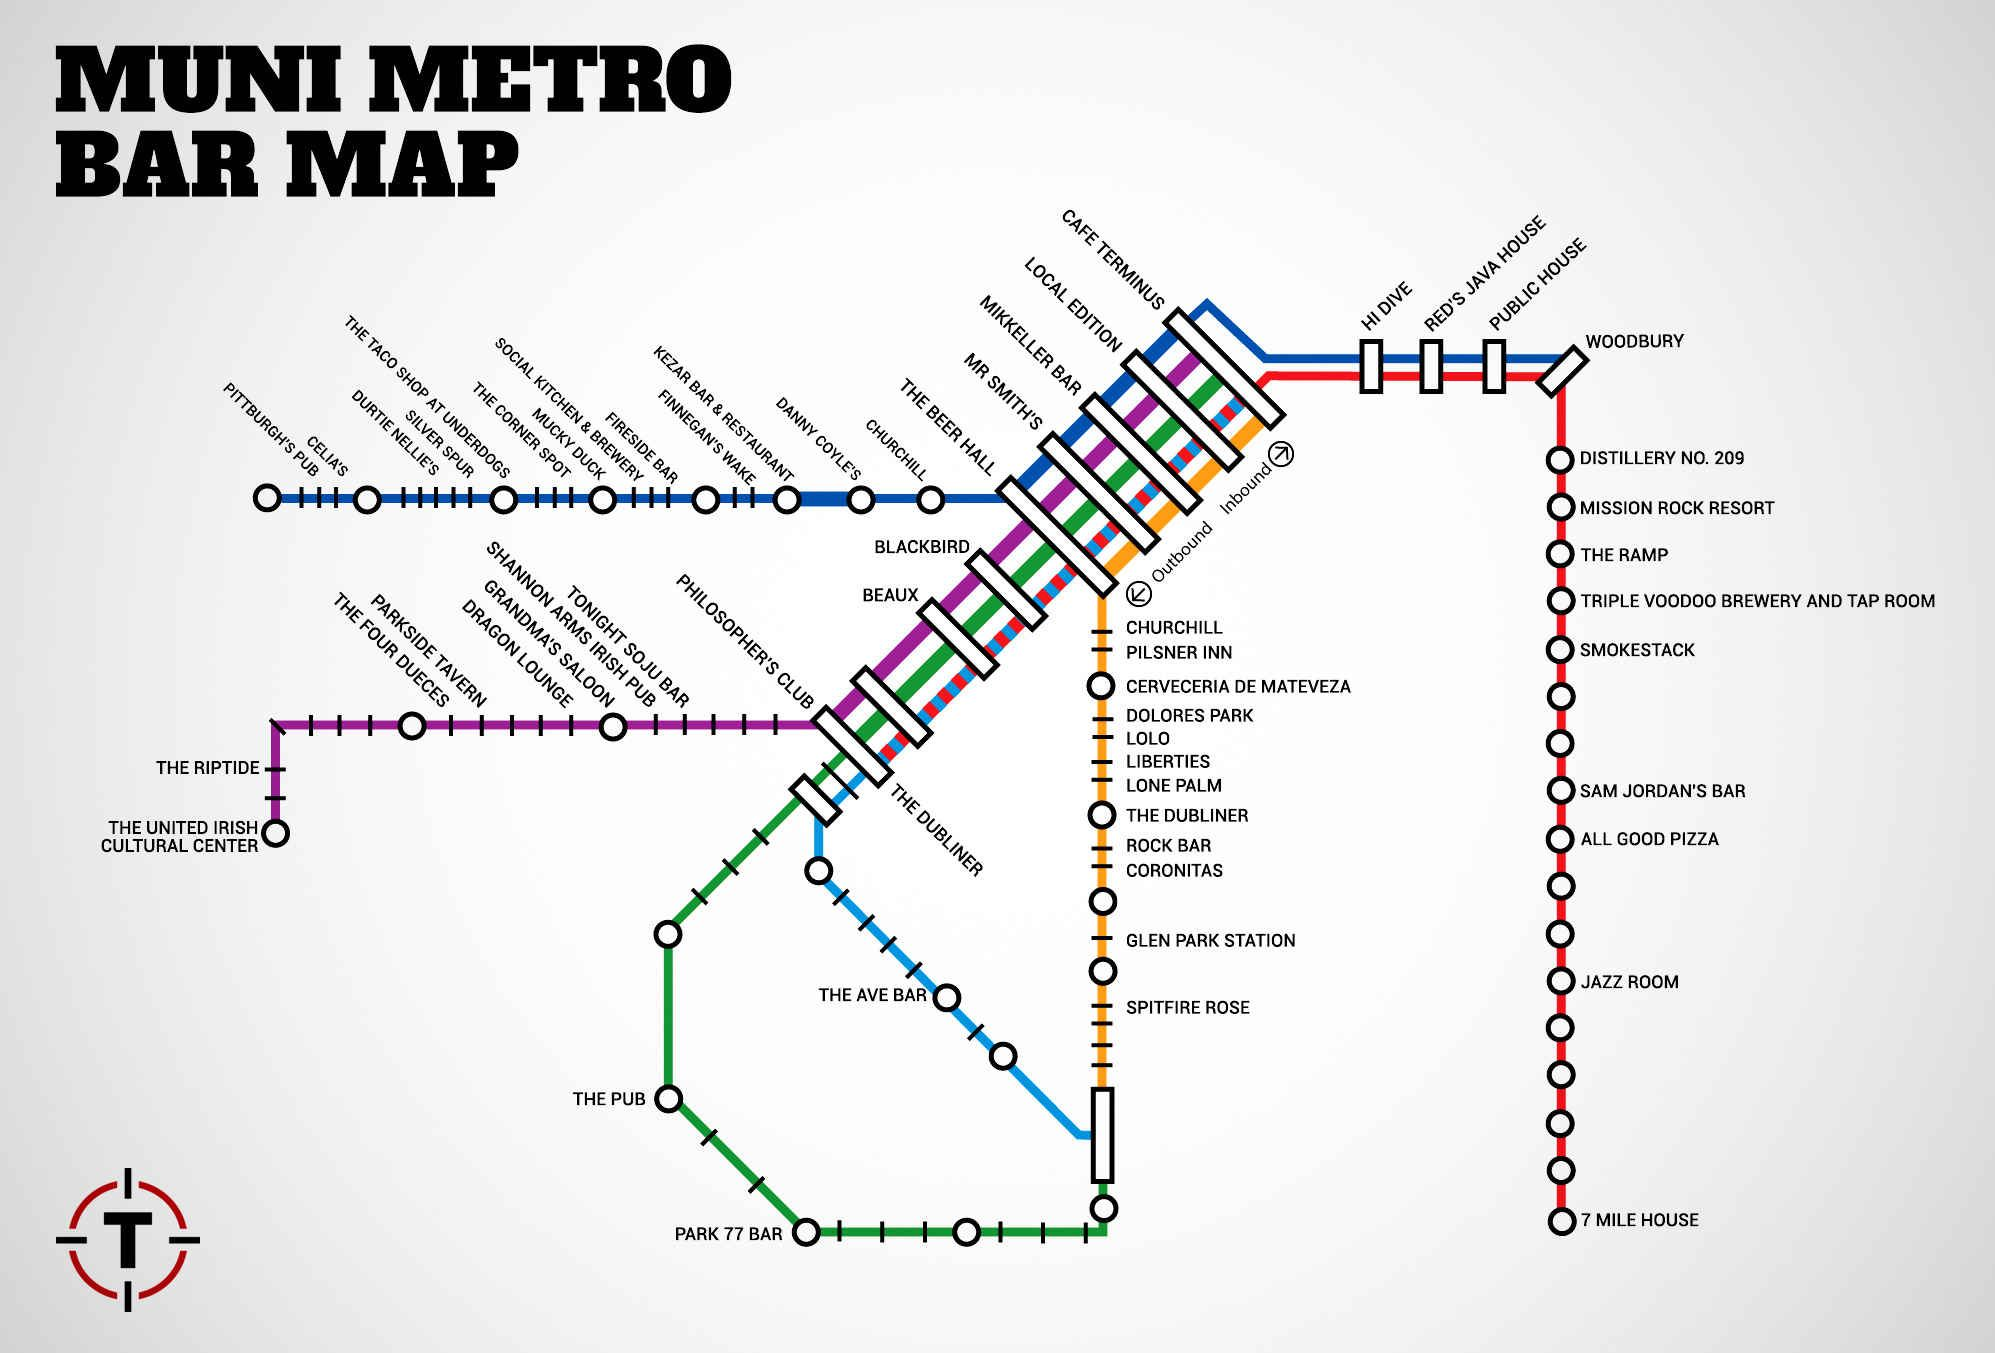 San Francisco Muni Metro Map.Sf S First Ever Muni Metro Bar Map San Francisco Pinterest Map